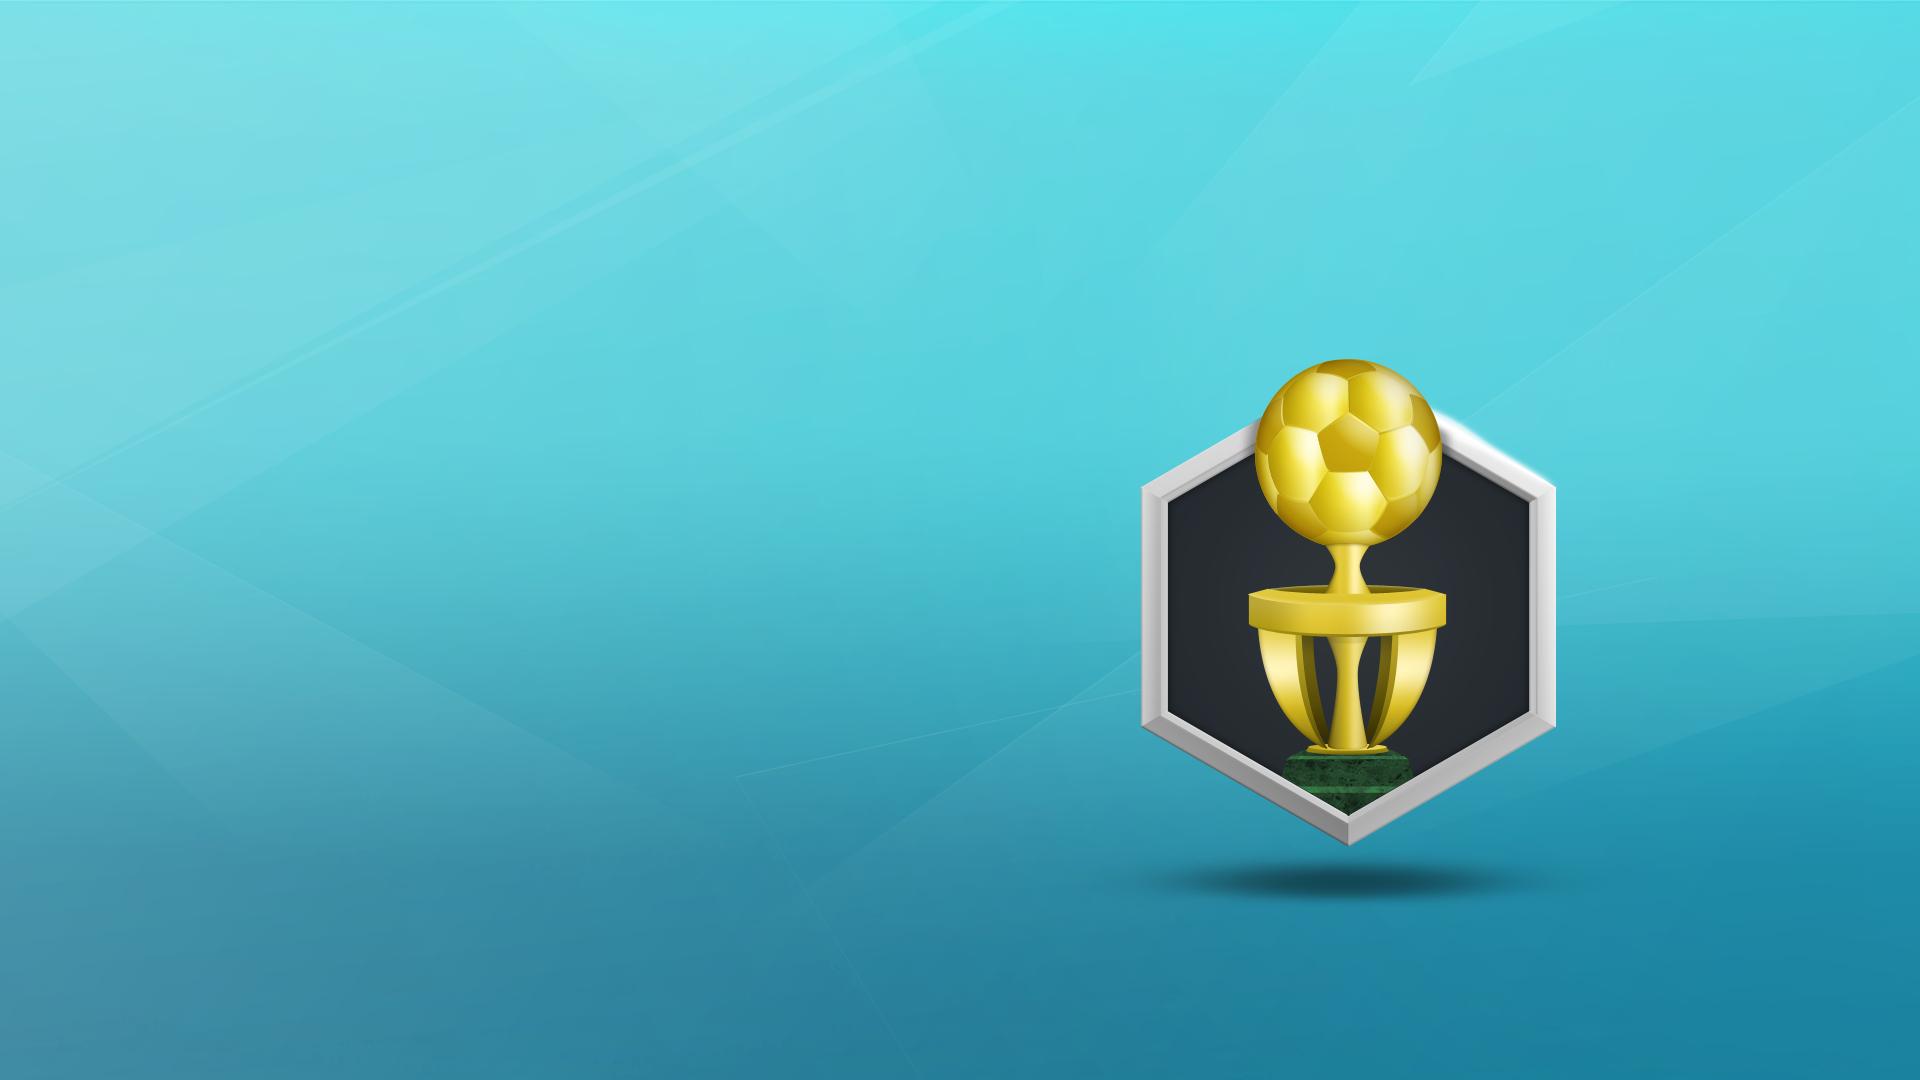 Icon for New silverware